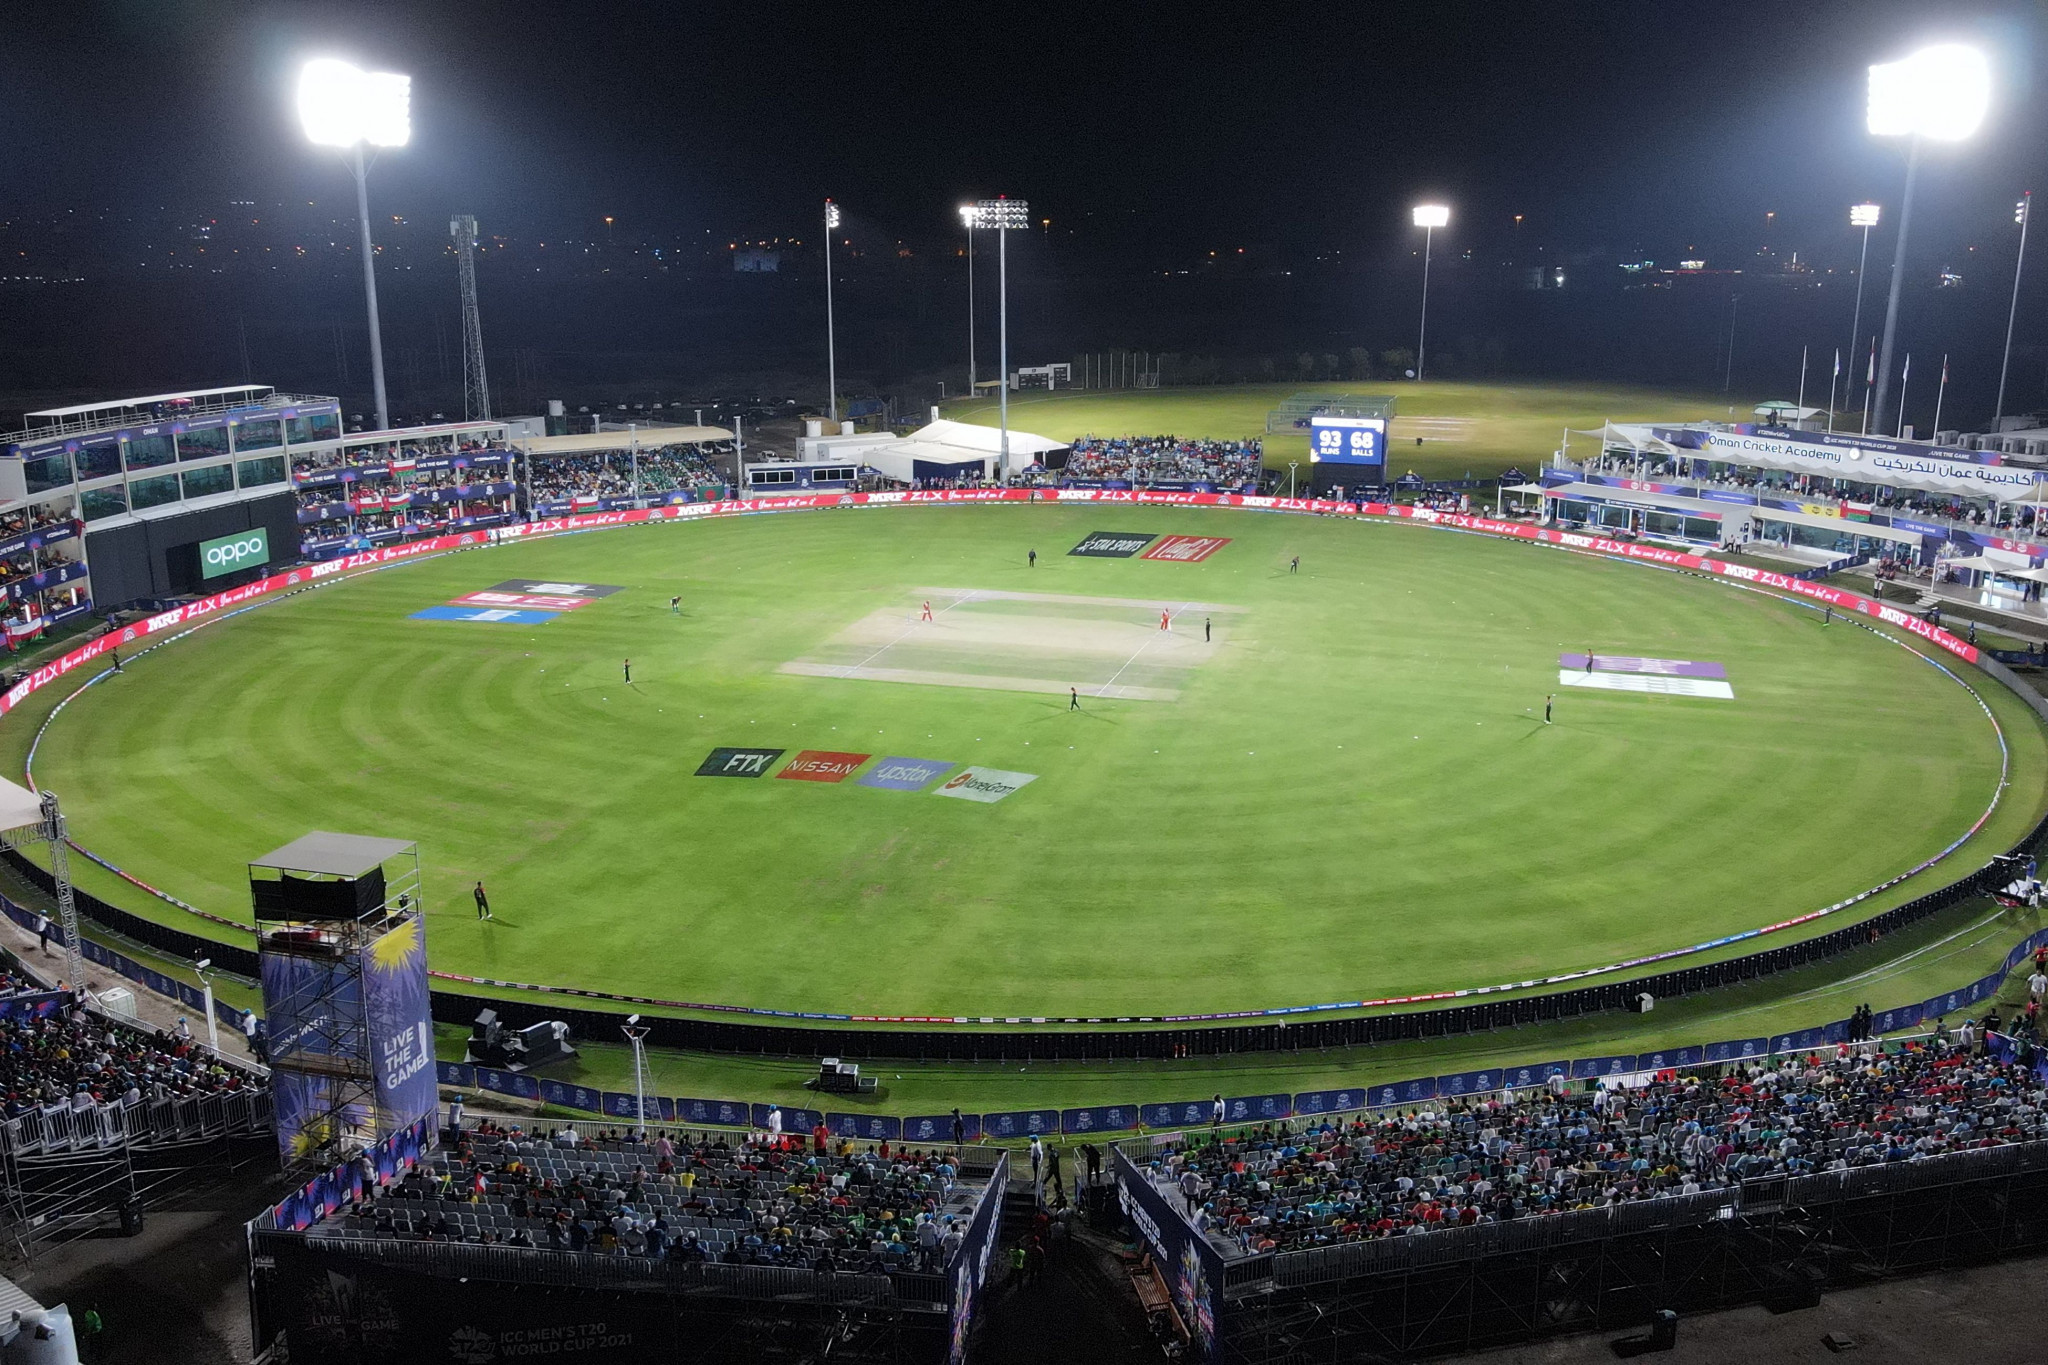 Dettol named as official hygiene partner of Men's T20 World Cup